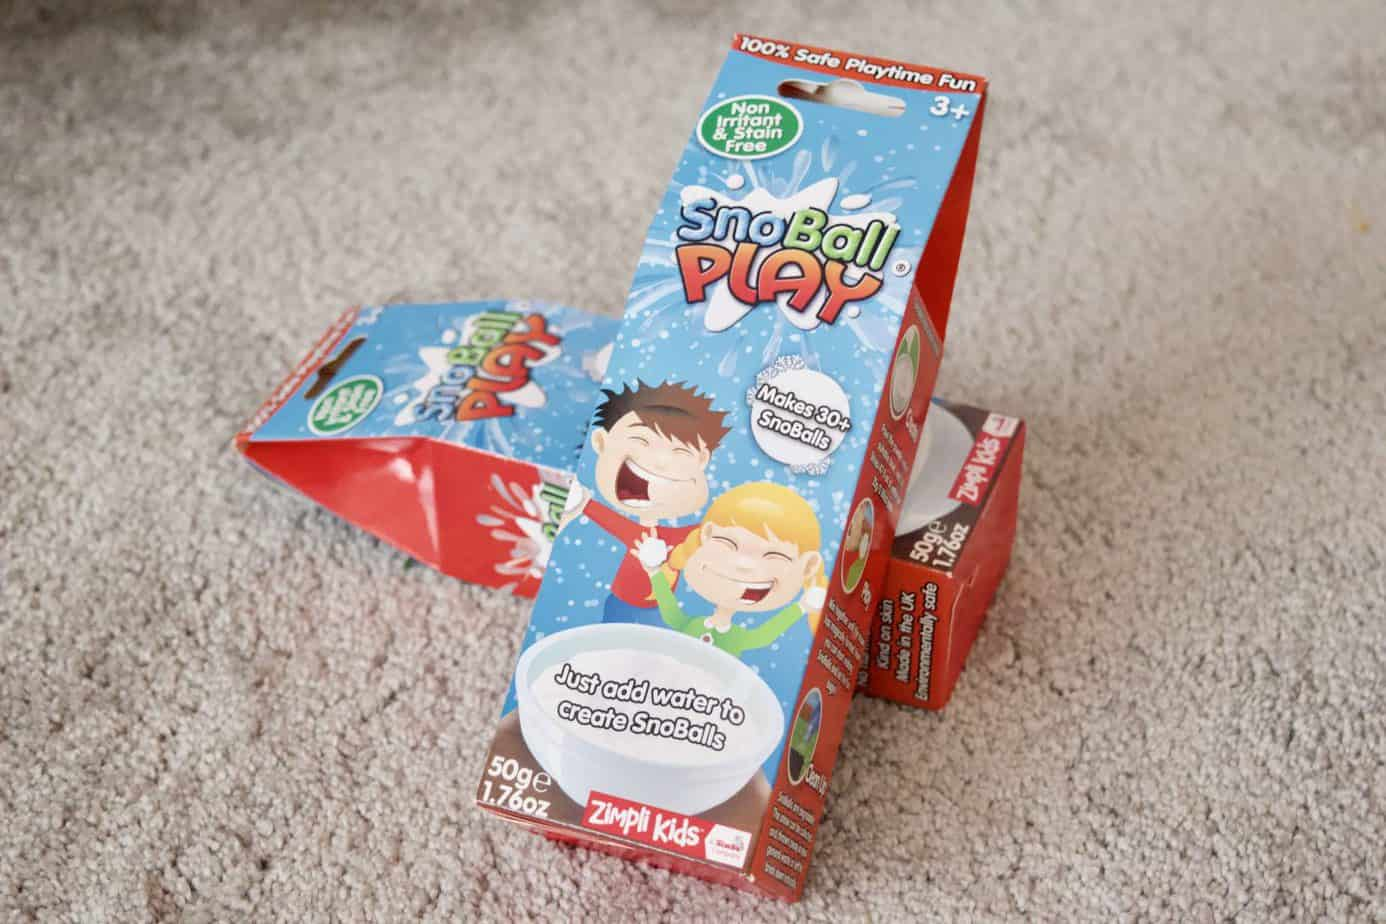 2 packs of Snoball play from Zimpli kids